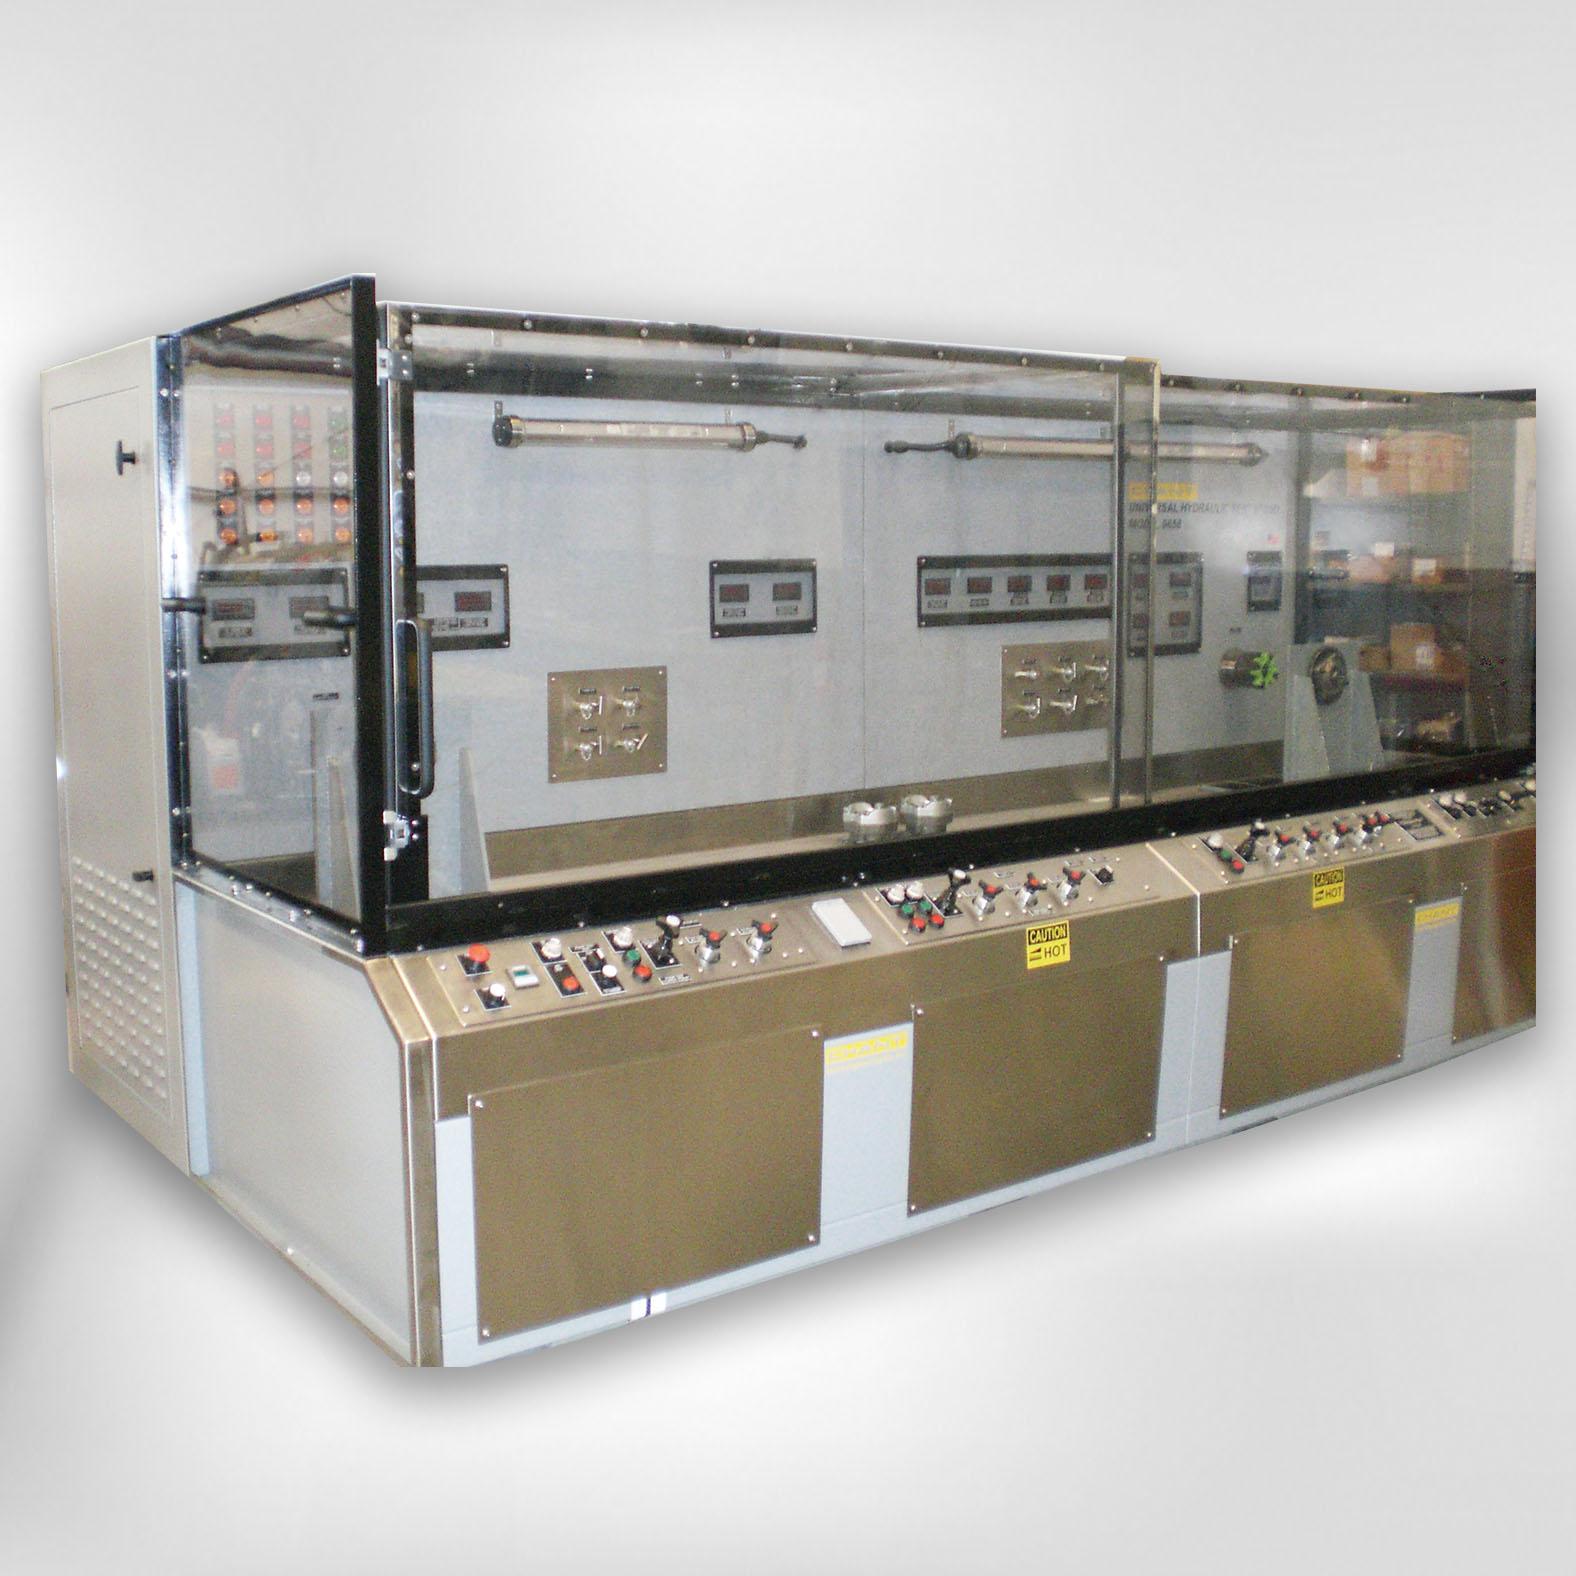 965801 Universal Hydraulic Test Stand